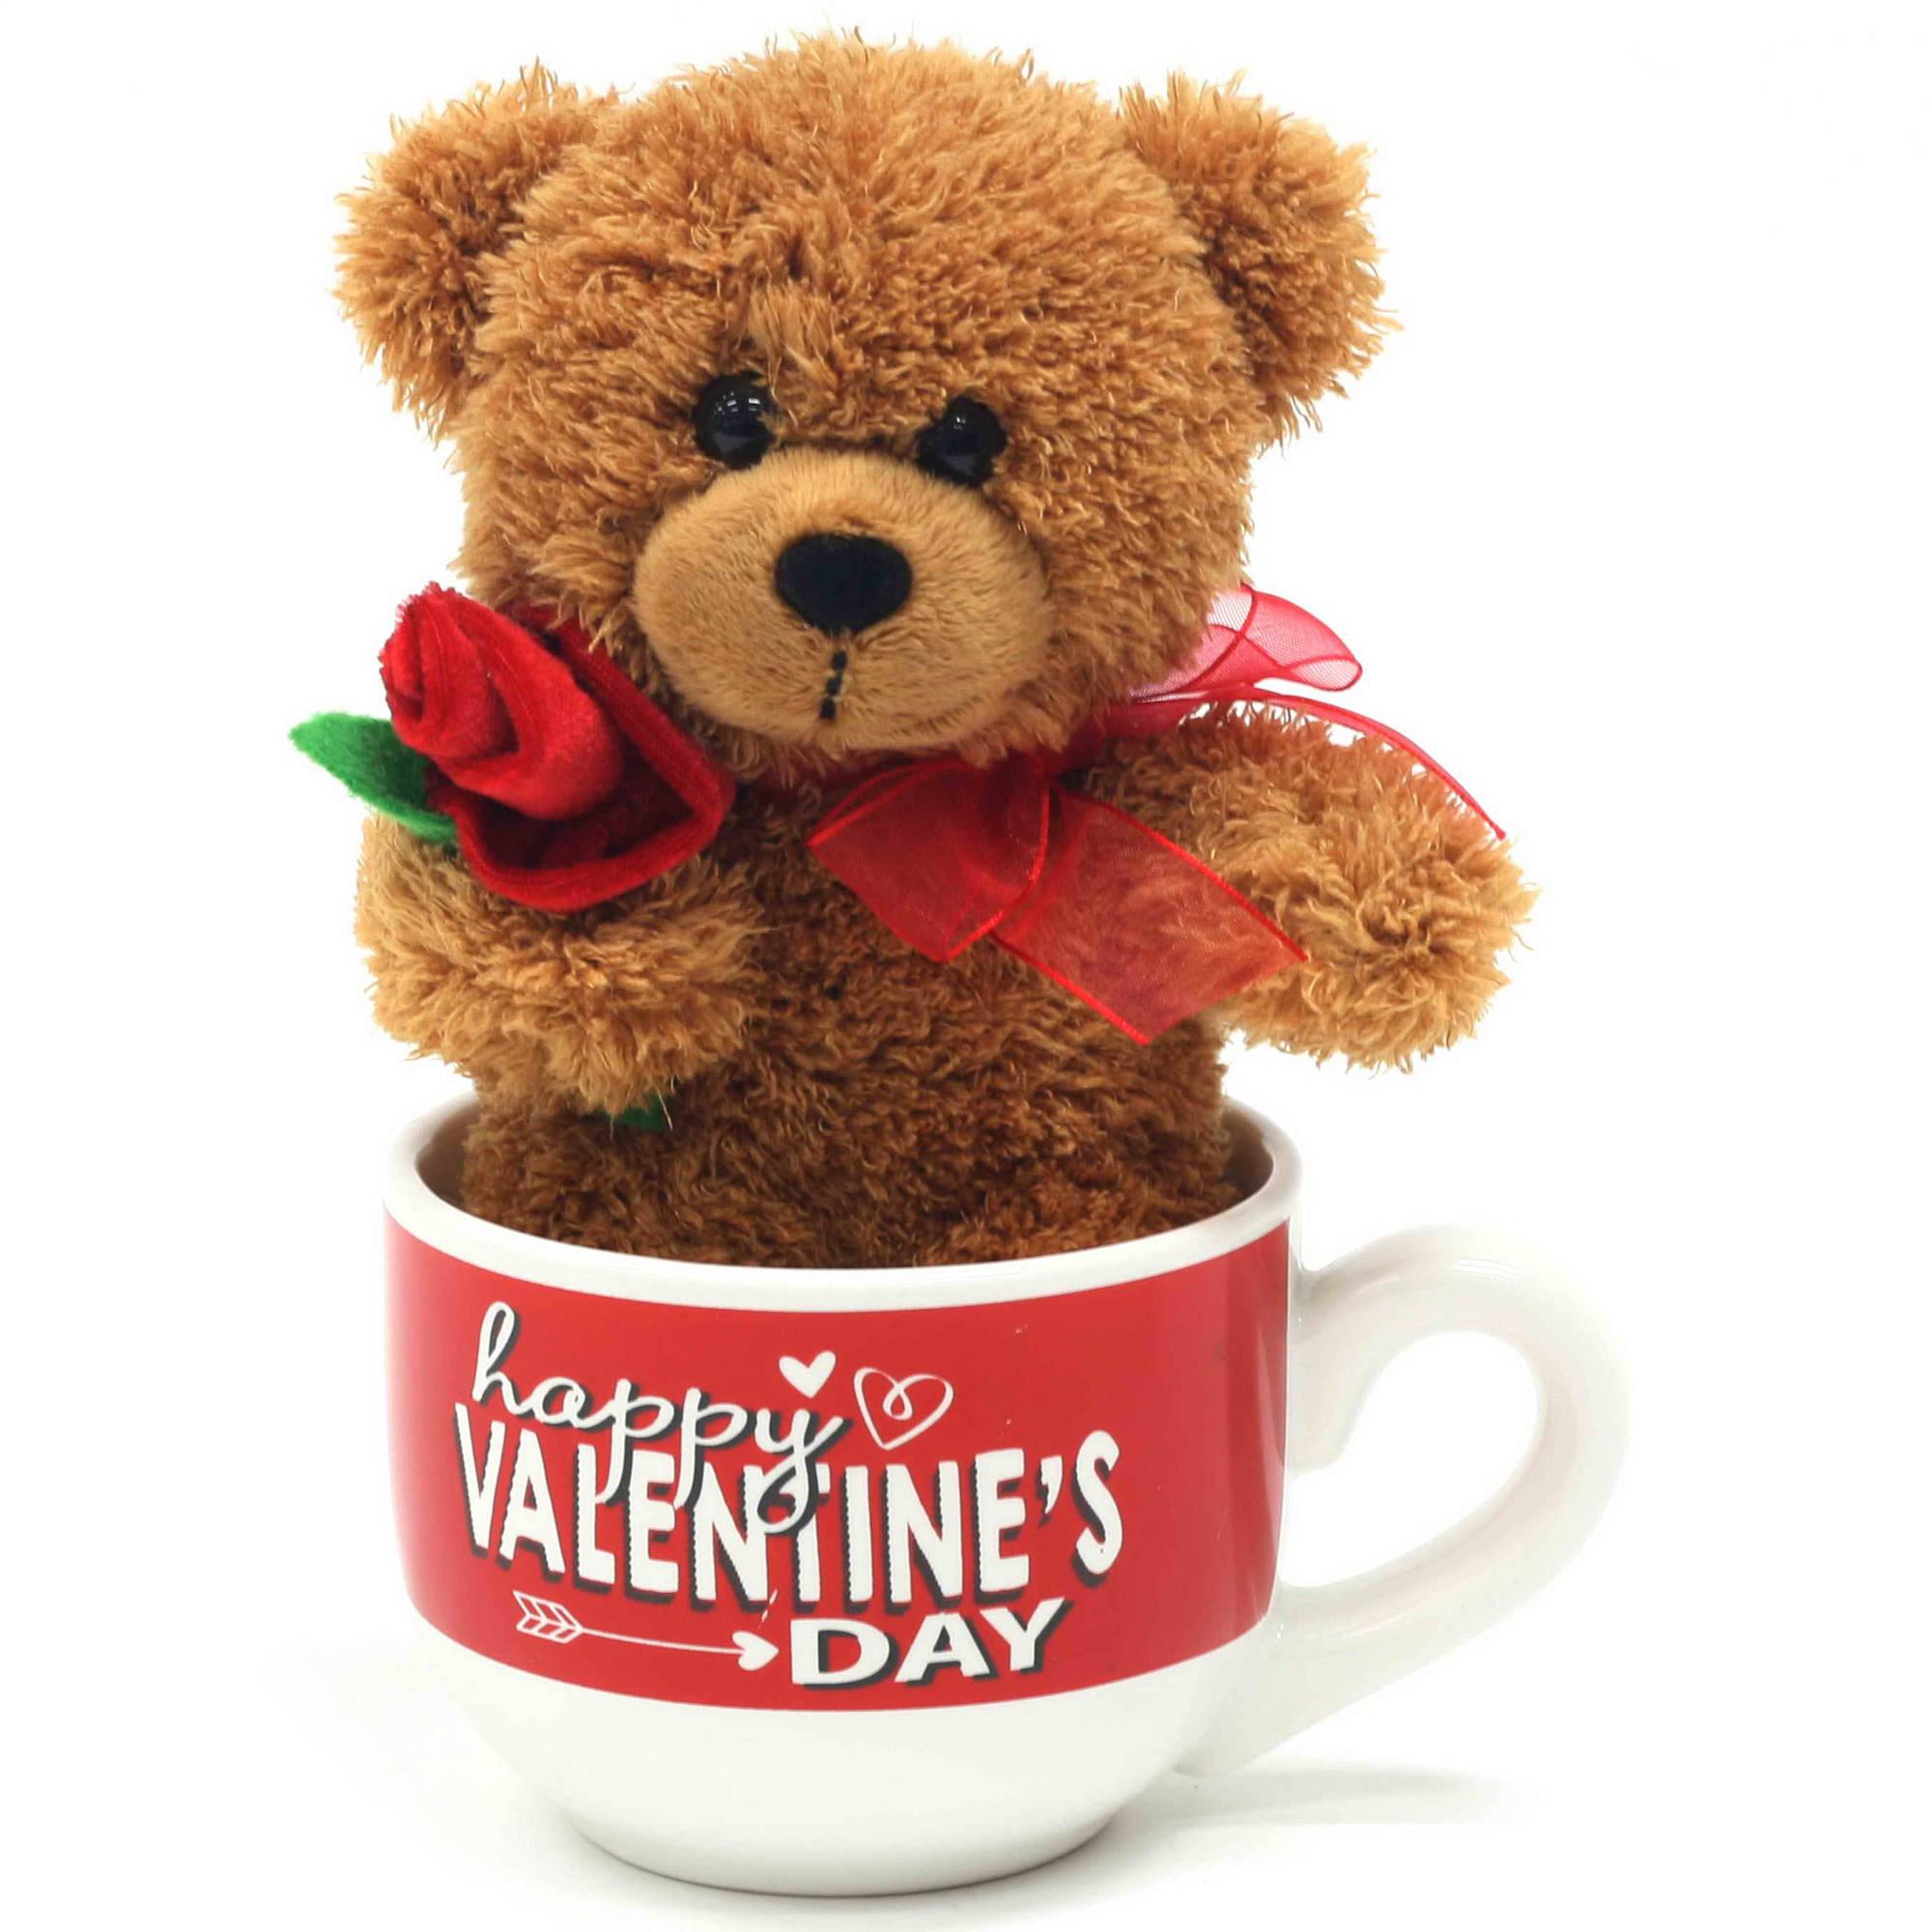 Valentine Brown Plush Teddy Bear With Plush Rose Latte Mug Set   Walmart.com